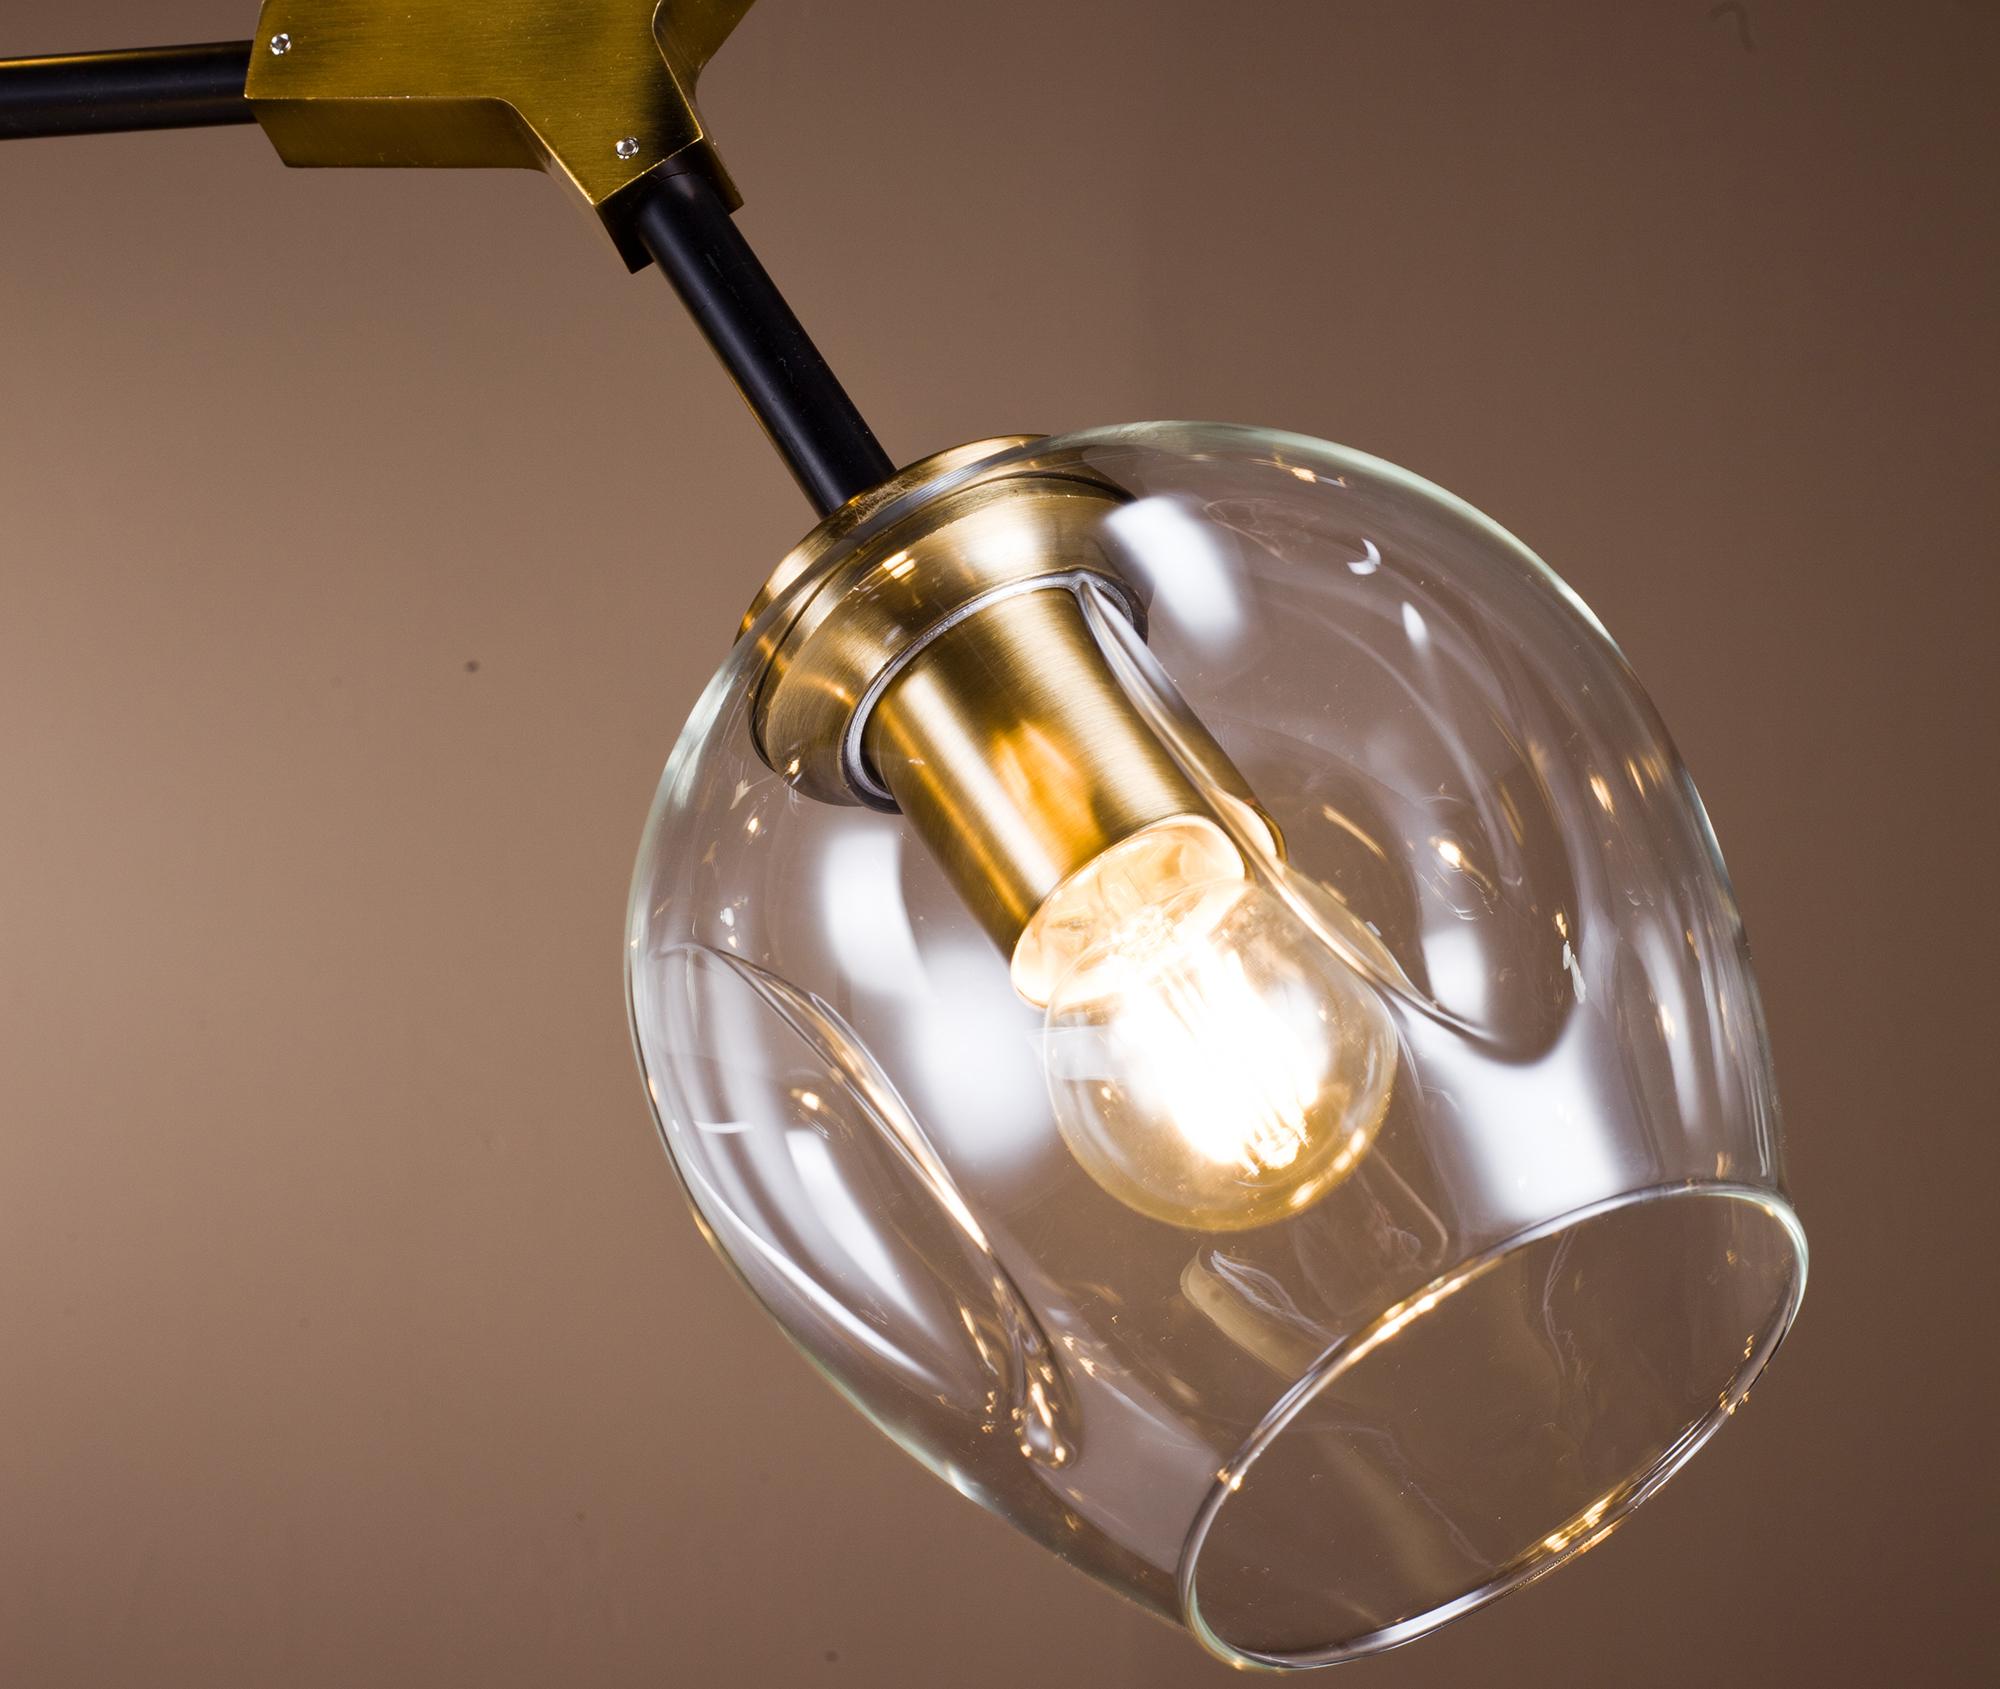 Liang & Eimil Orbital Pendant Lamp GD-LGT-0105 (3)